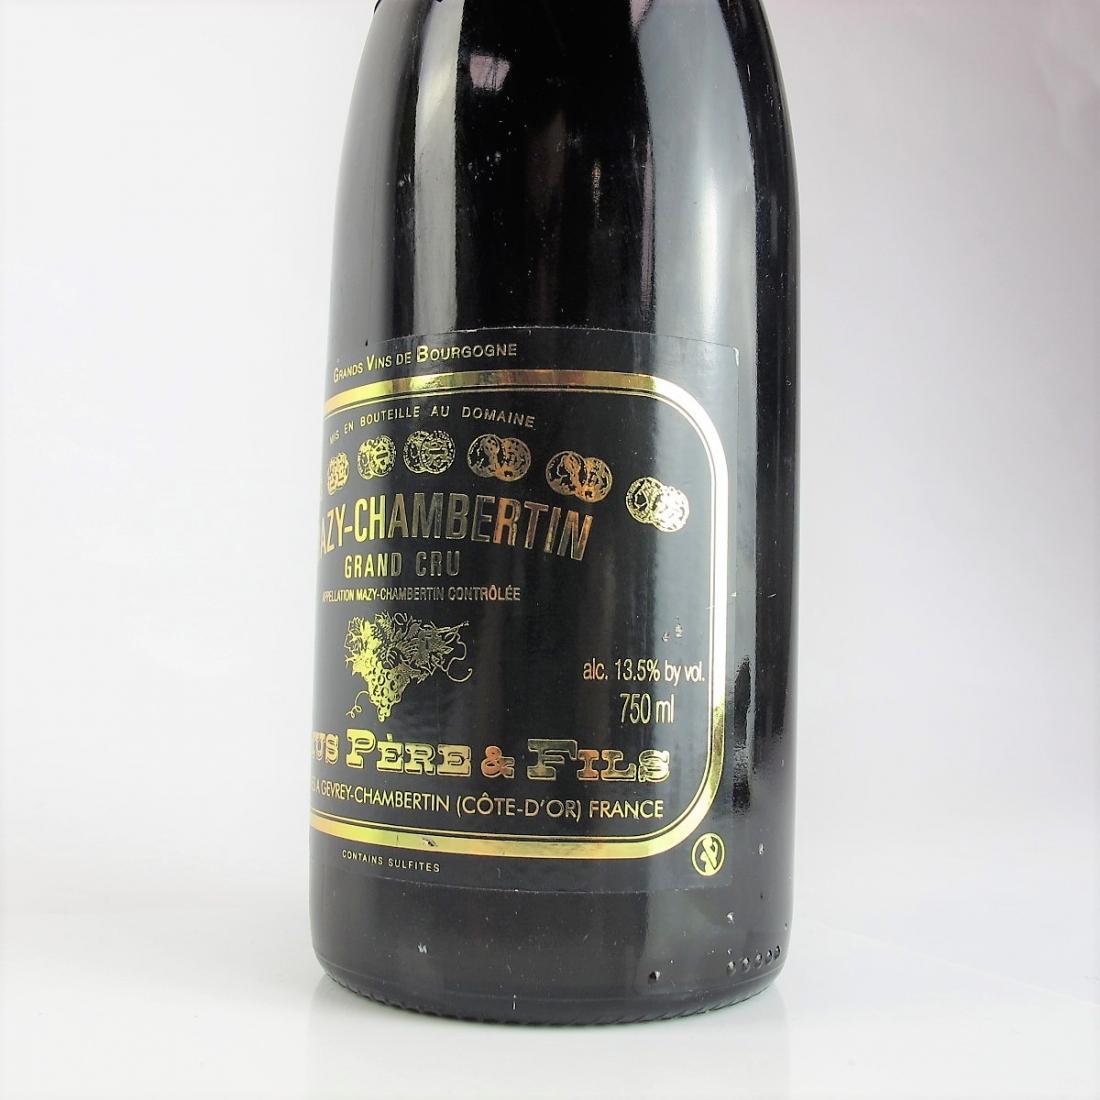 Camus Pere & Fils 2001 Mazy-Chambertin Grand-Cru